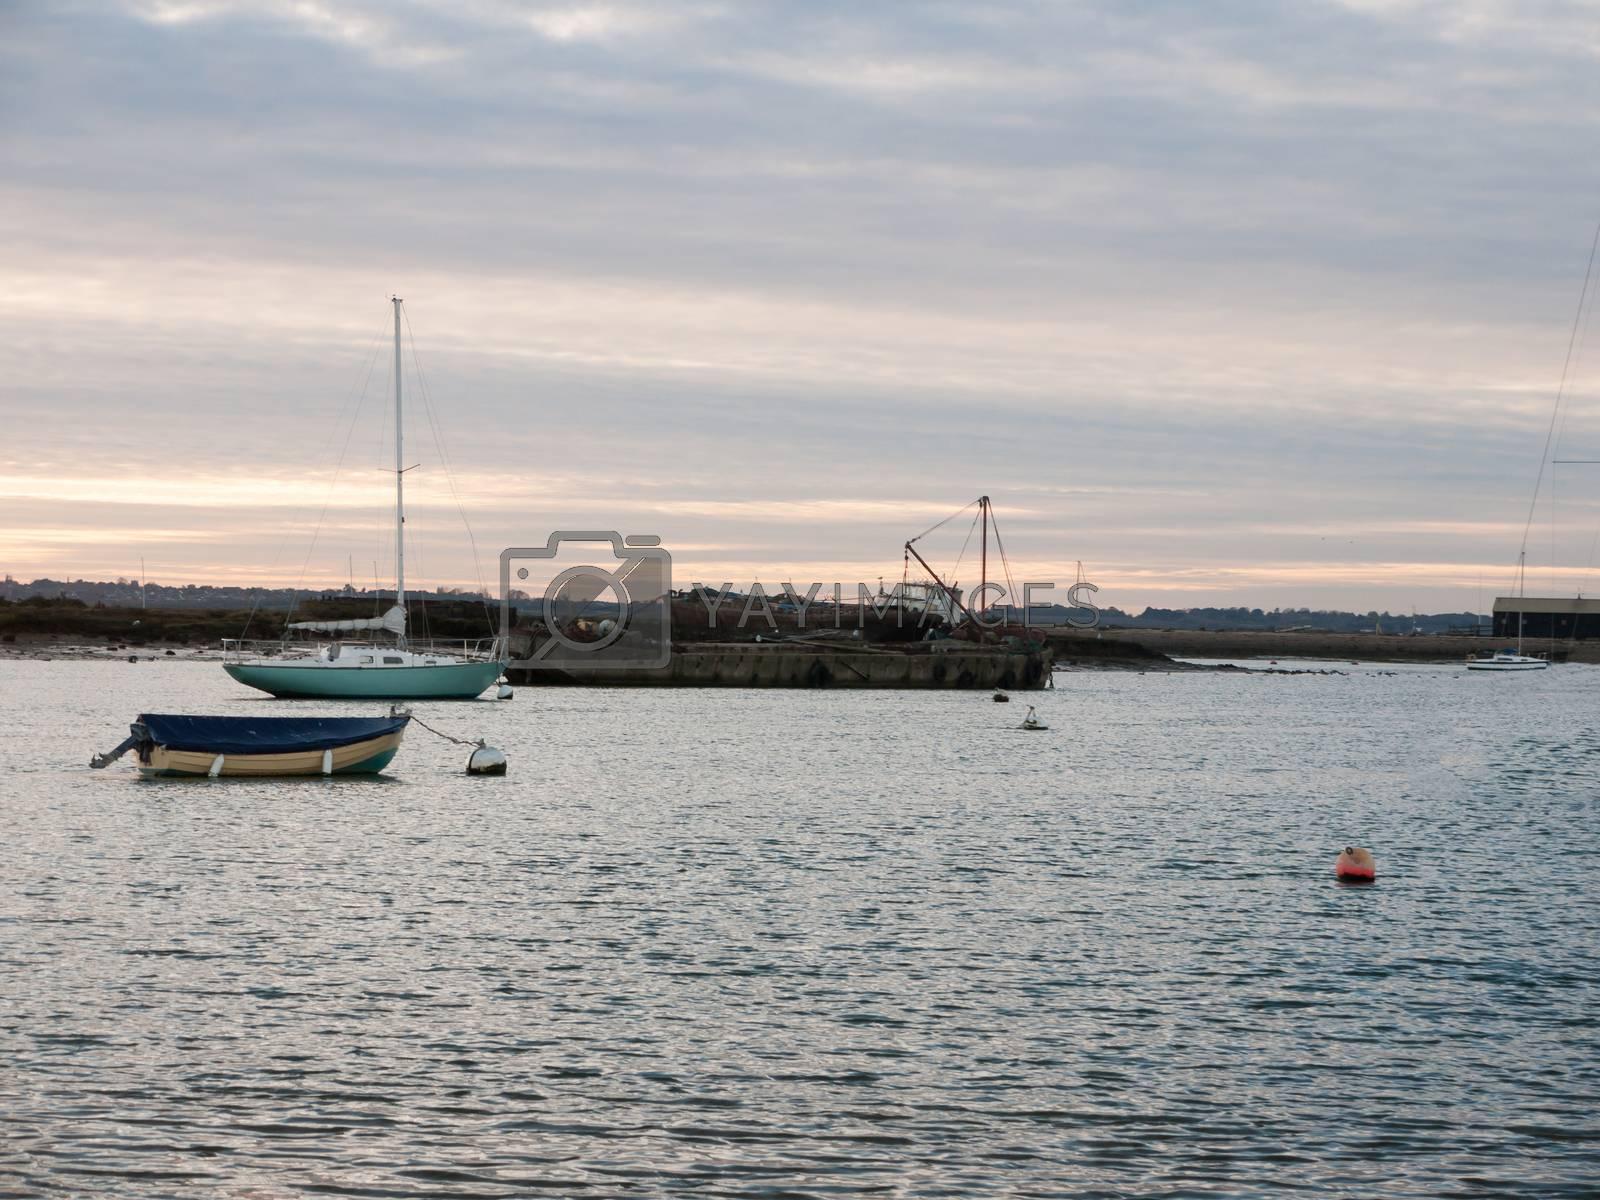 marina harbor ocean moored boats landscape empty sun set space; west mersea, essex, england, uk